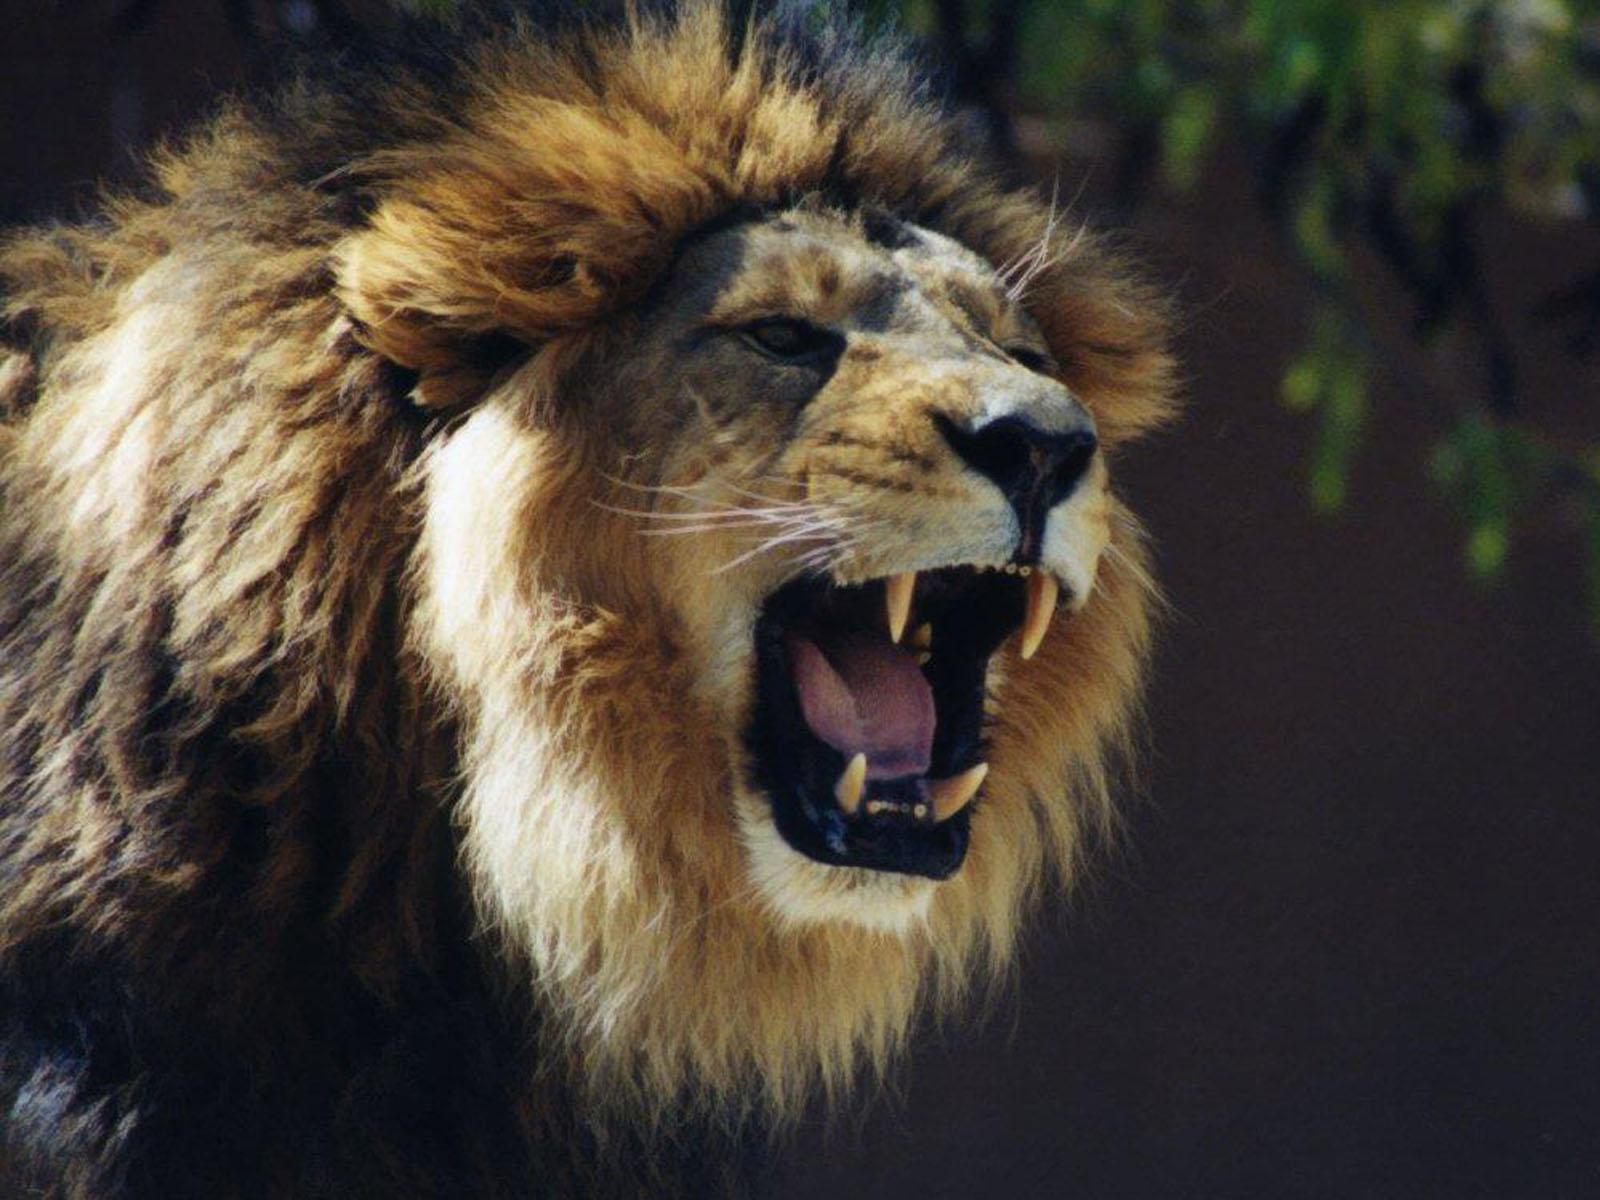 http://2.bp.blogspot.com/-hEJRJCYfuzs/T32e8HdV3gI/AAAAAAAAB1s/02MSd4fvsw4/s1600/Lion%20Roaring%20Wallpapers%201.jpg